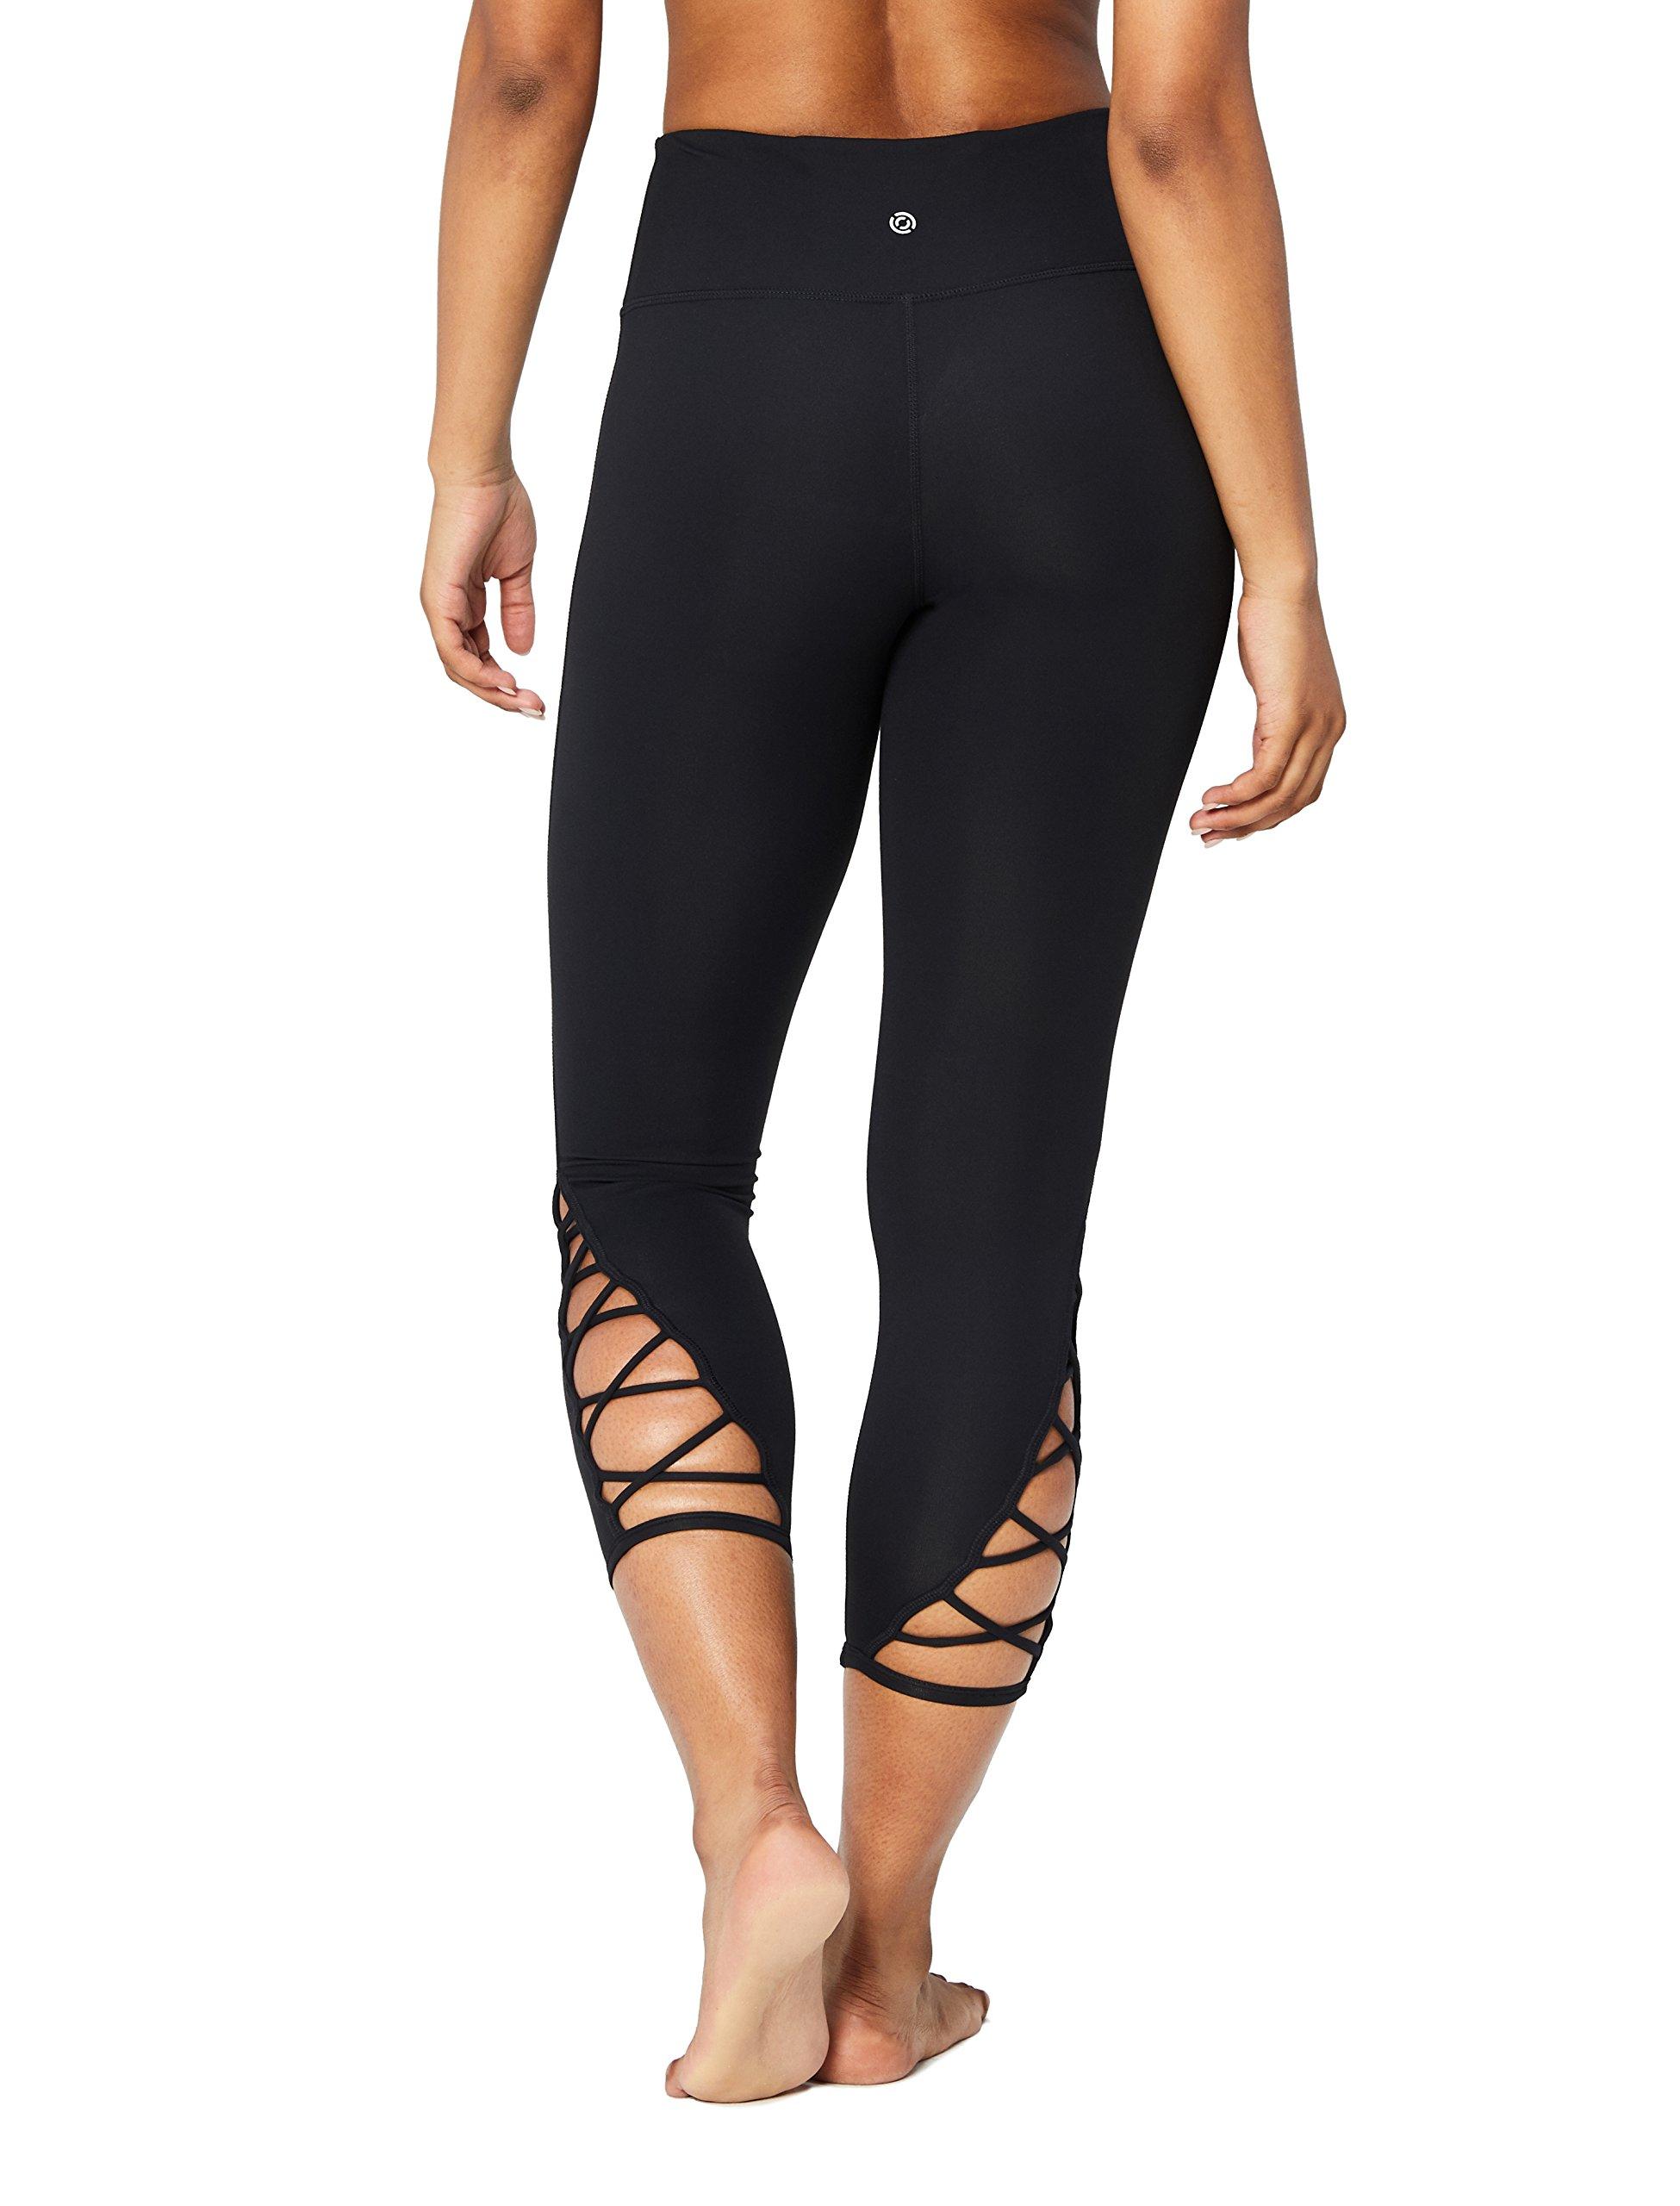 Core 10 Women's High Waist Yoga Lattice 7/8 Crop Legging - 24'', Denim, Large